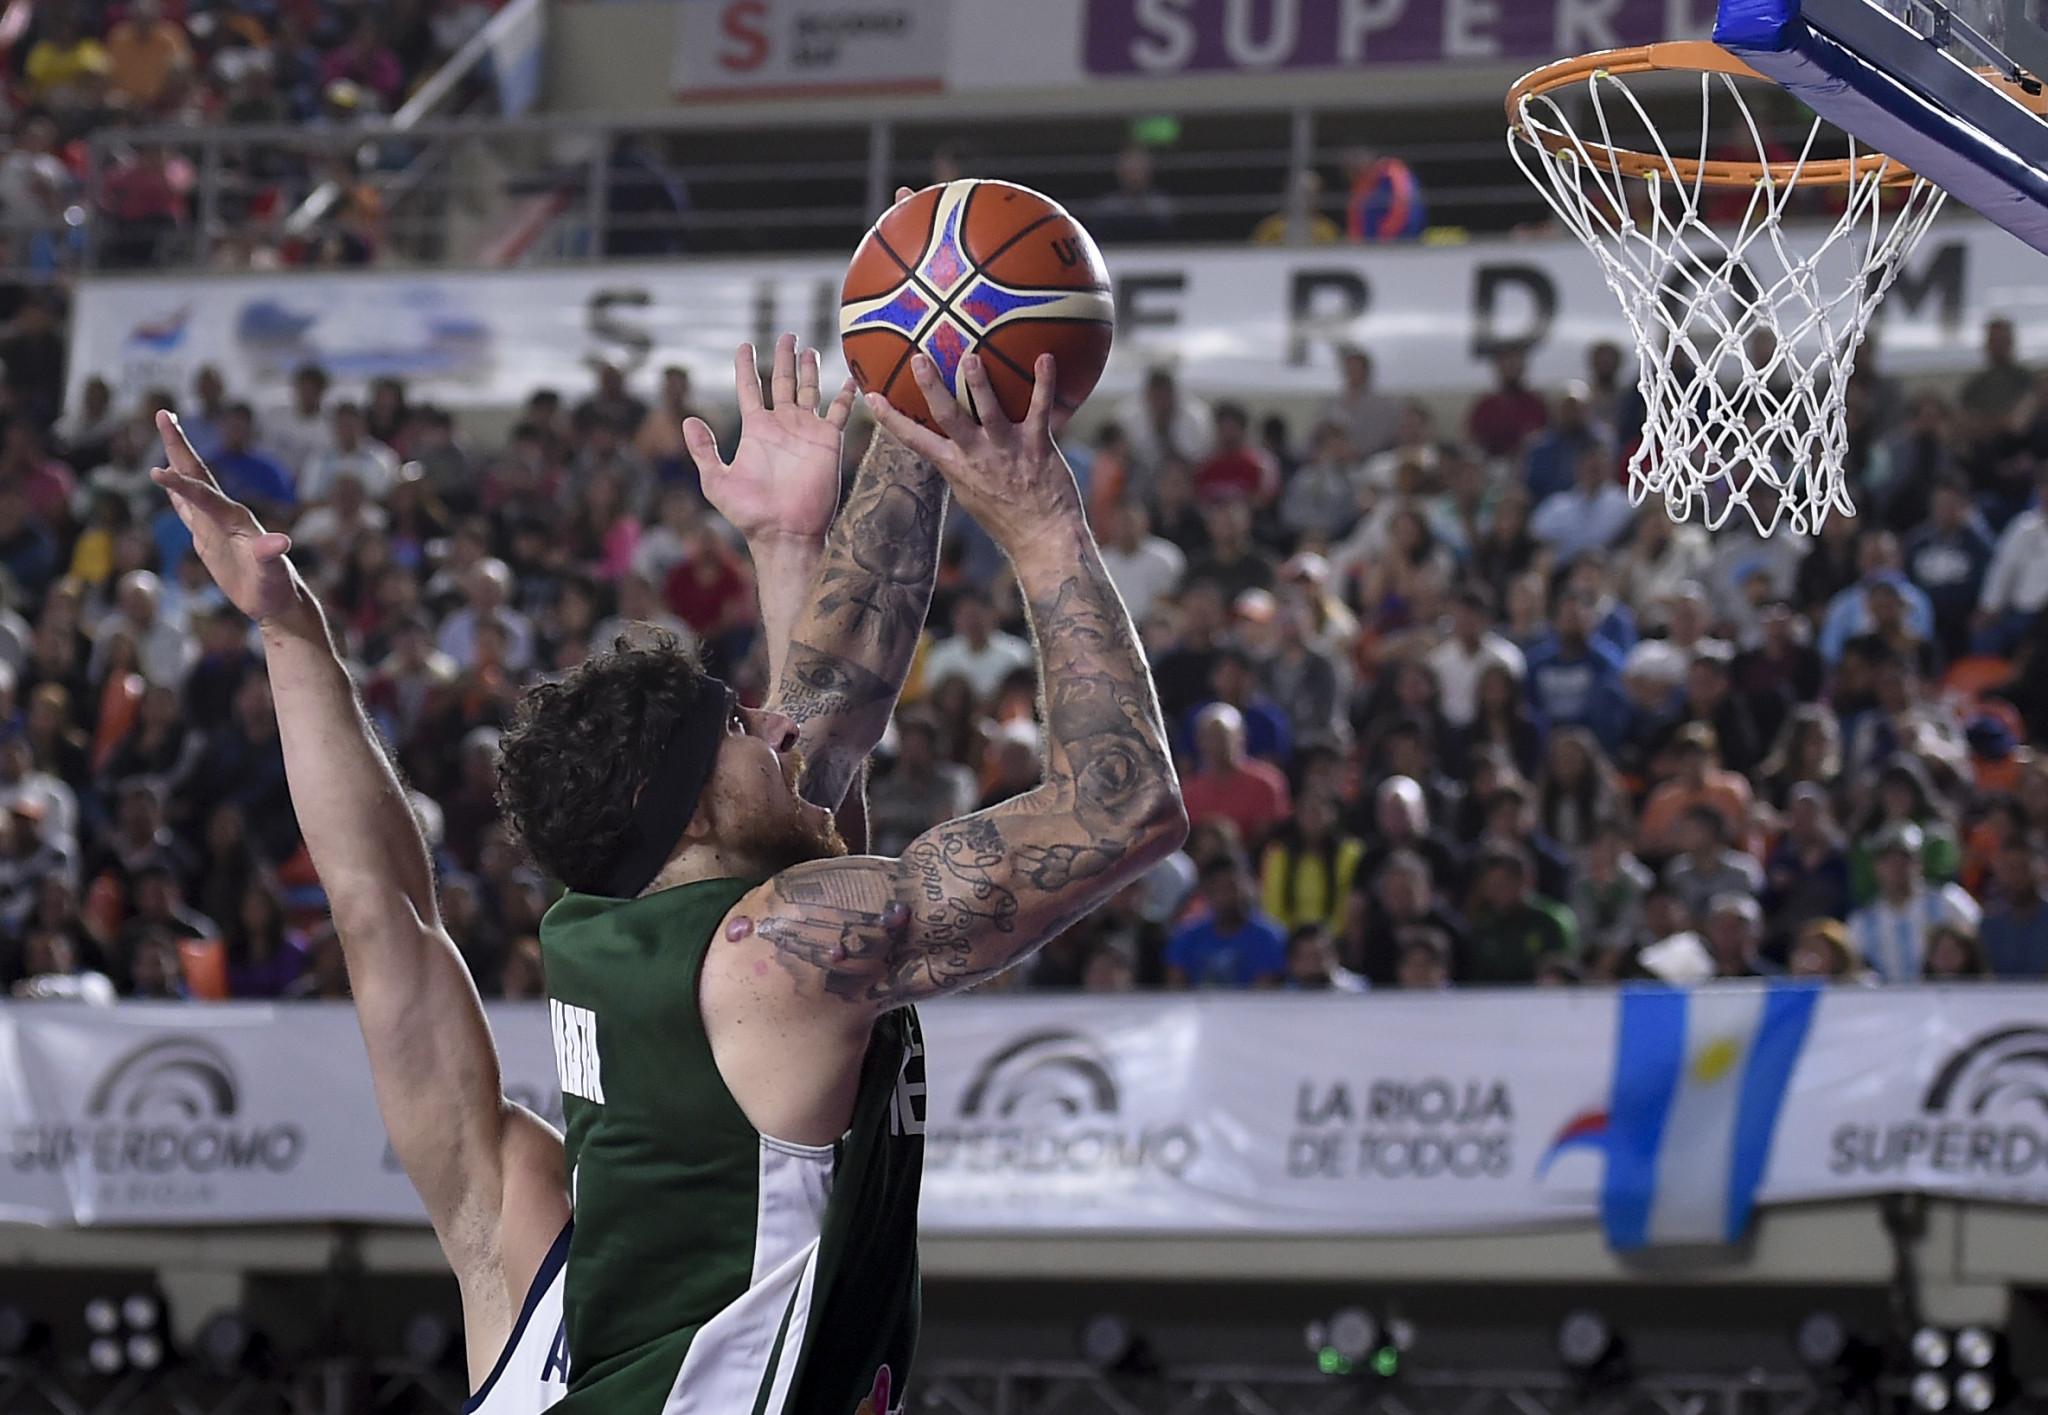 FIBA suspends Mexican Basketball Federation